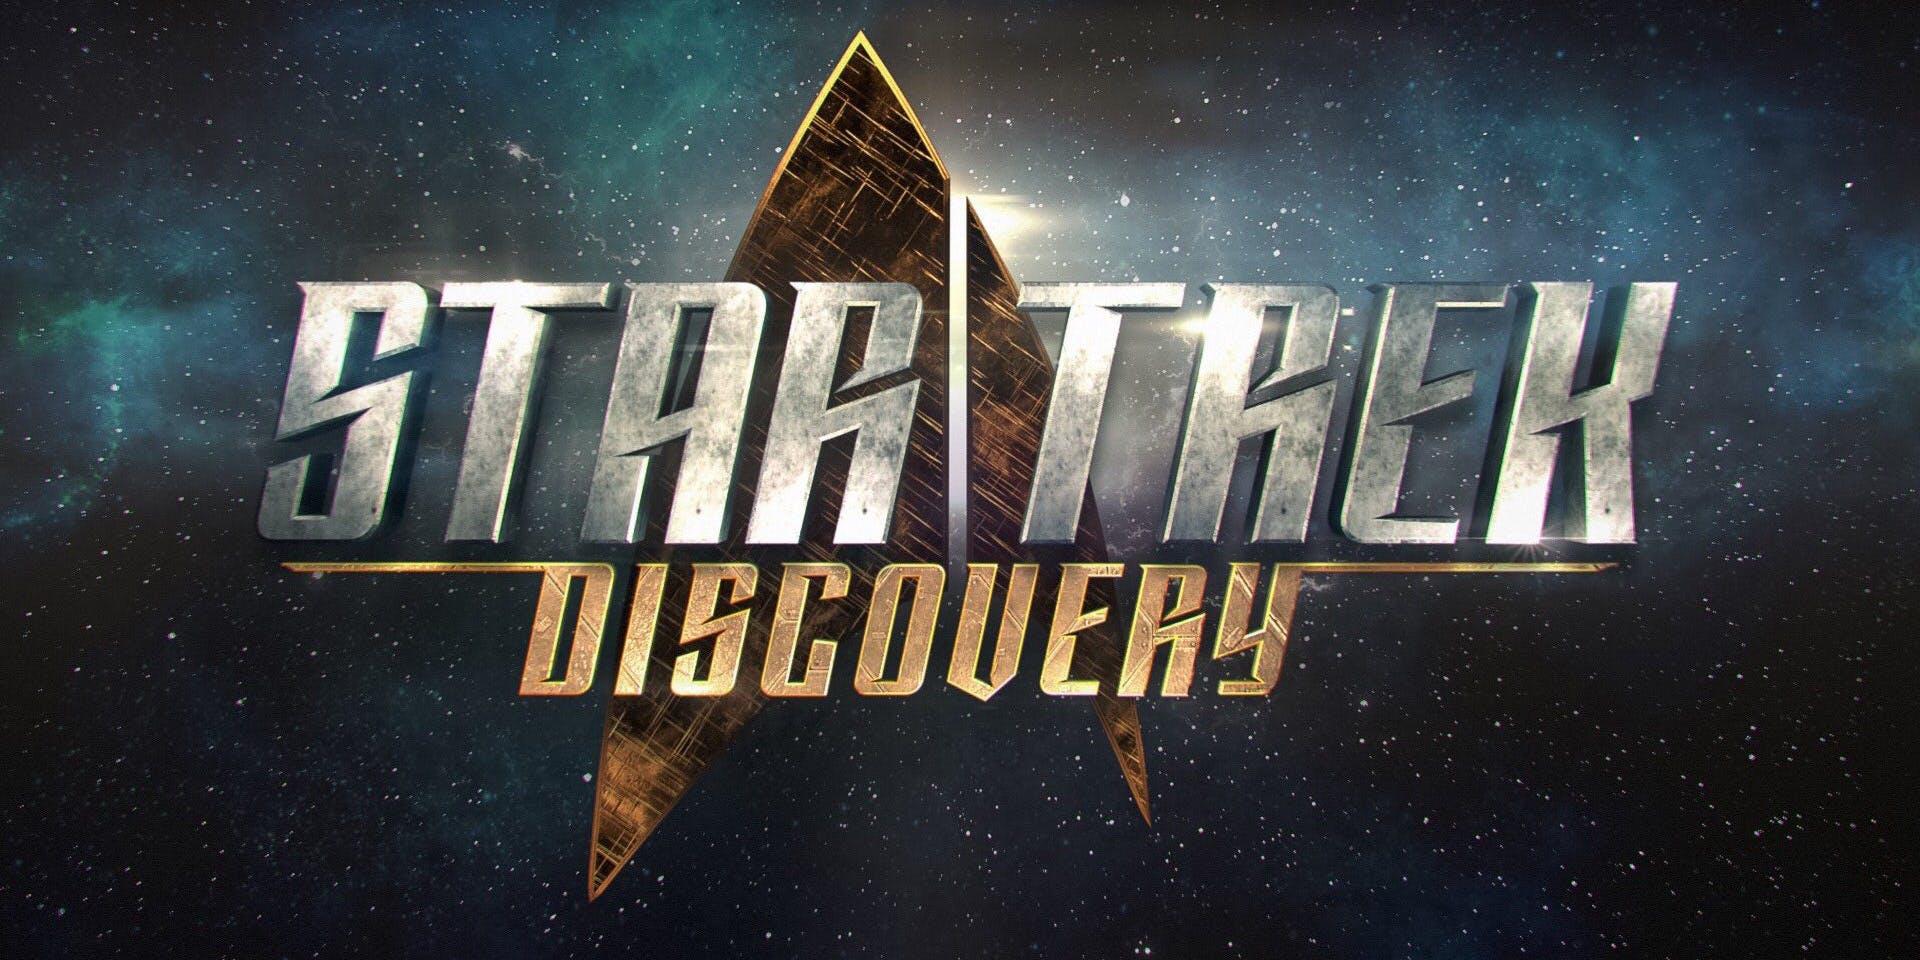 star trek discovery series 2.jpg